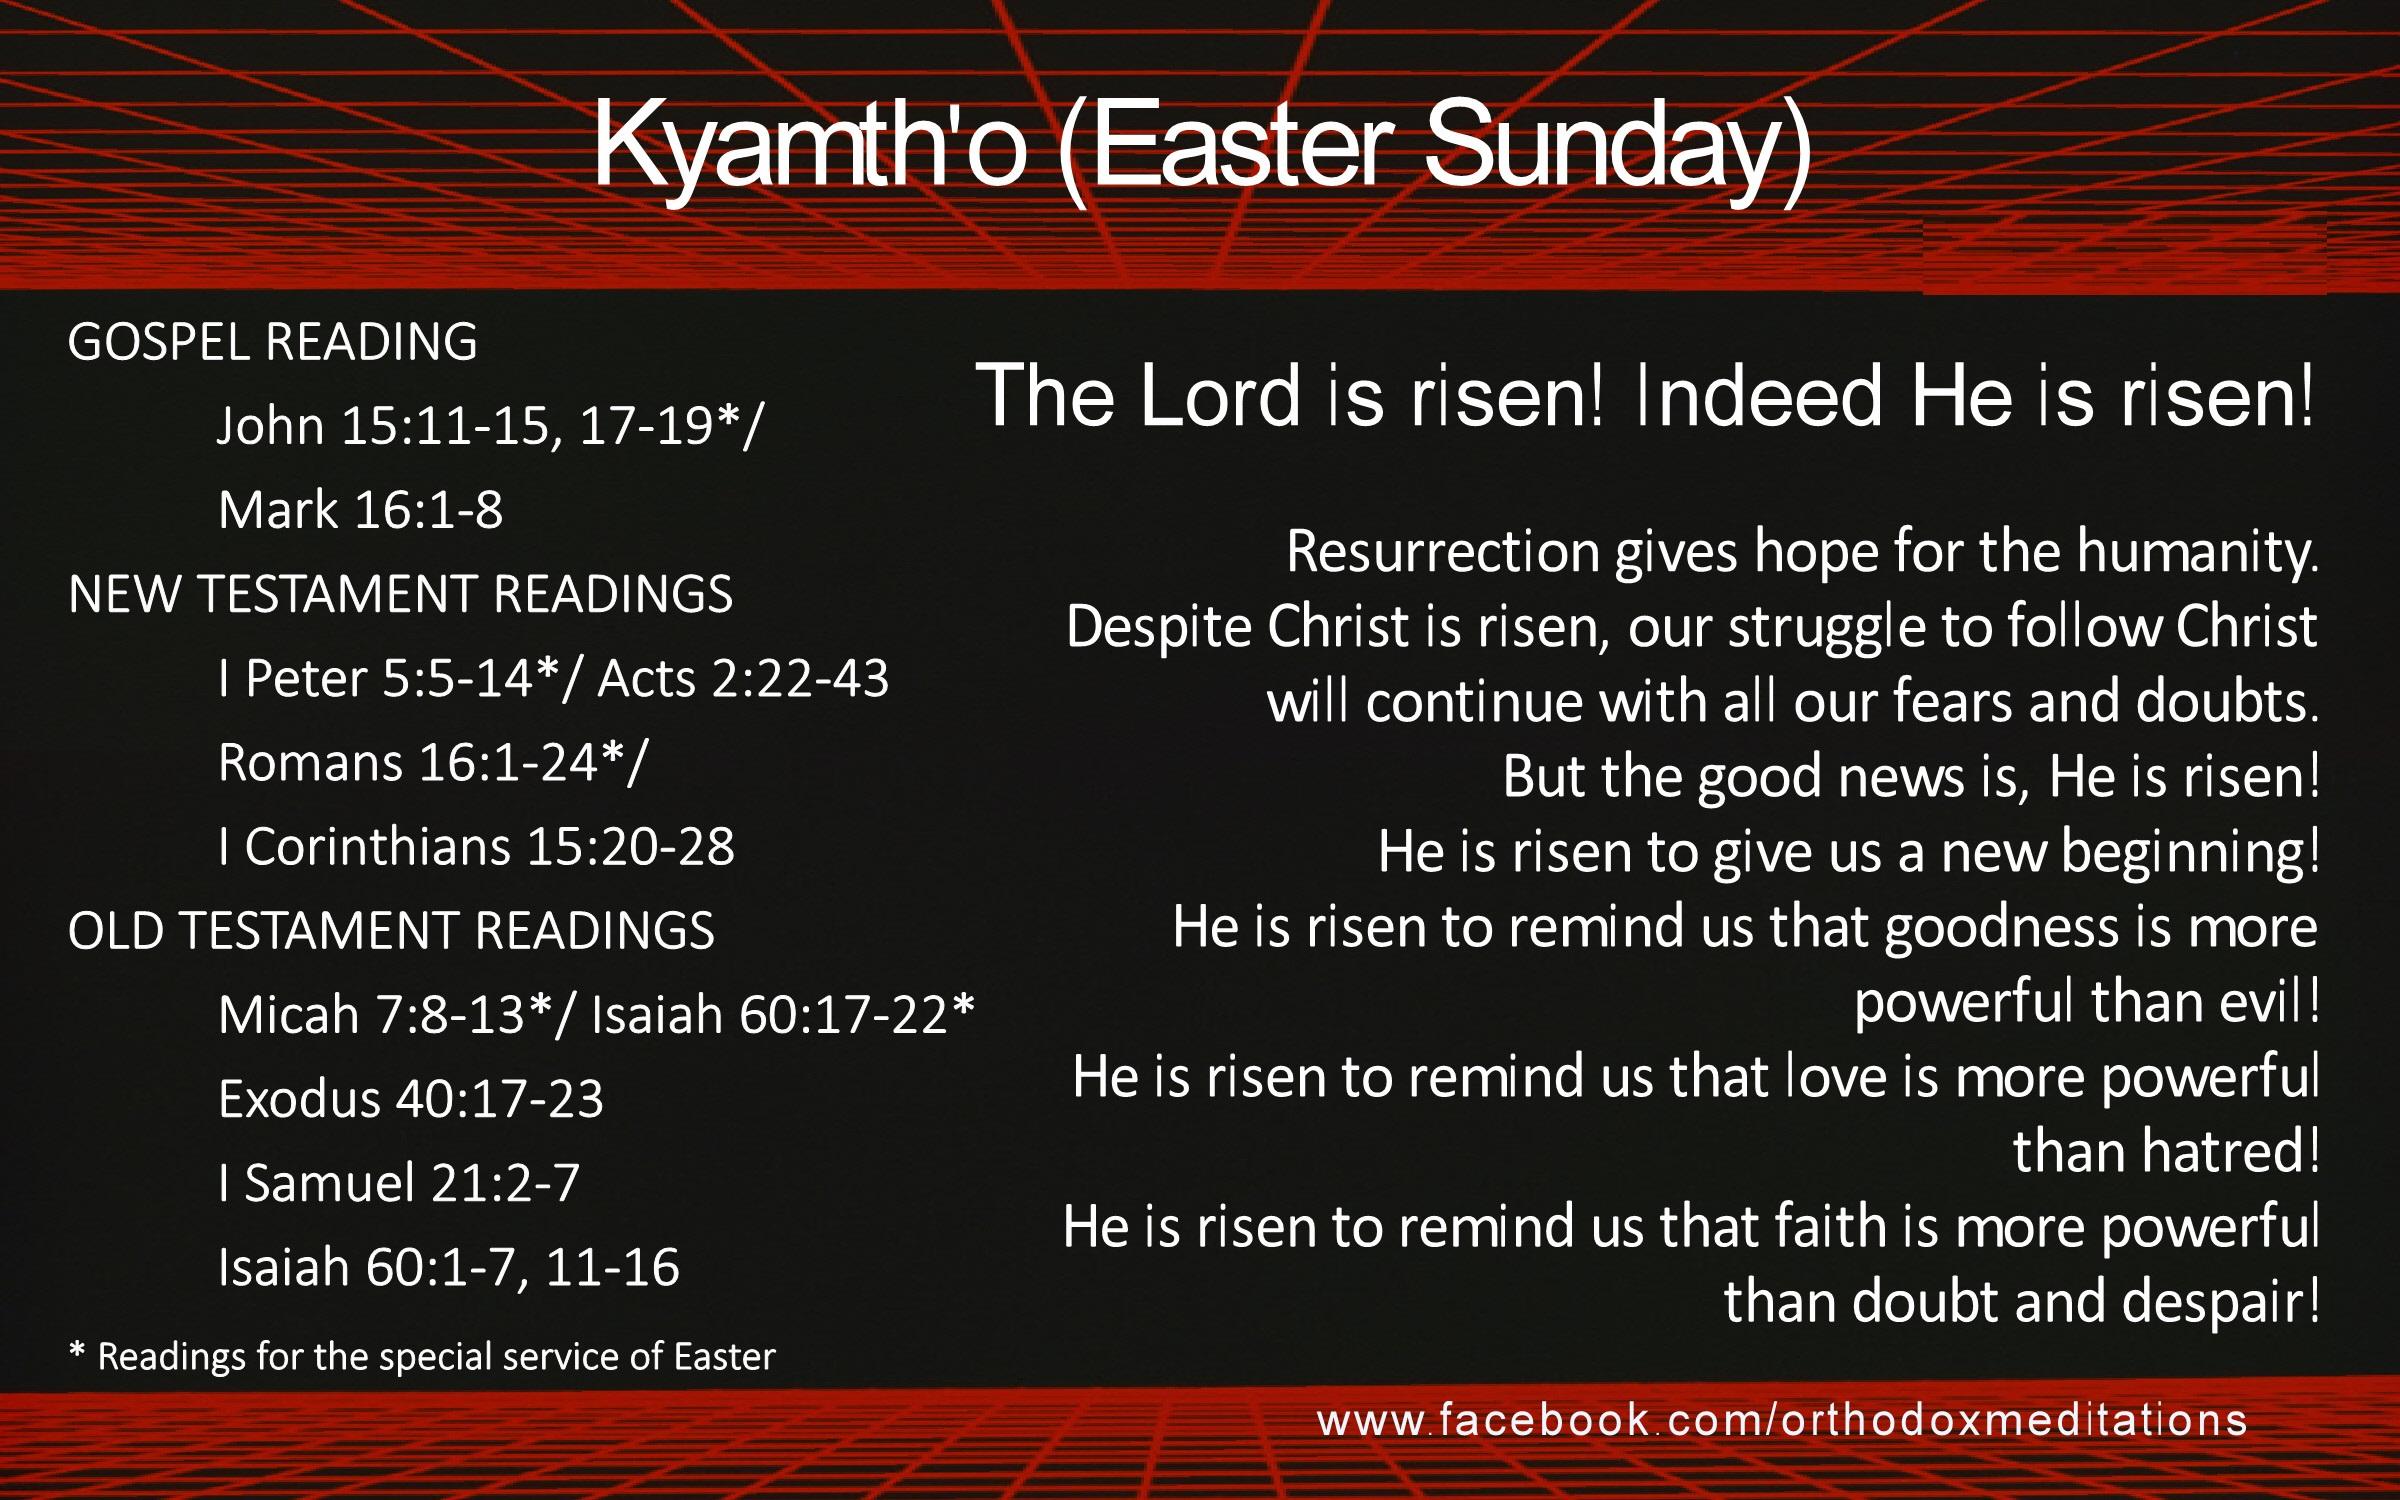 Kymtho-Sunday_001